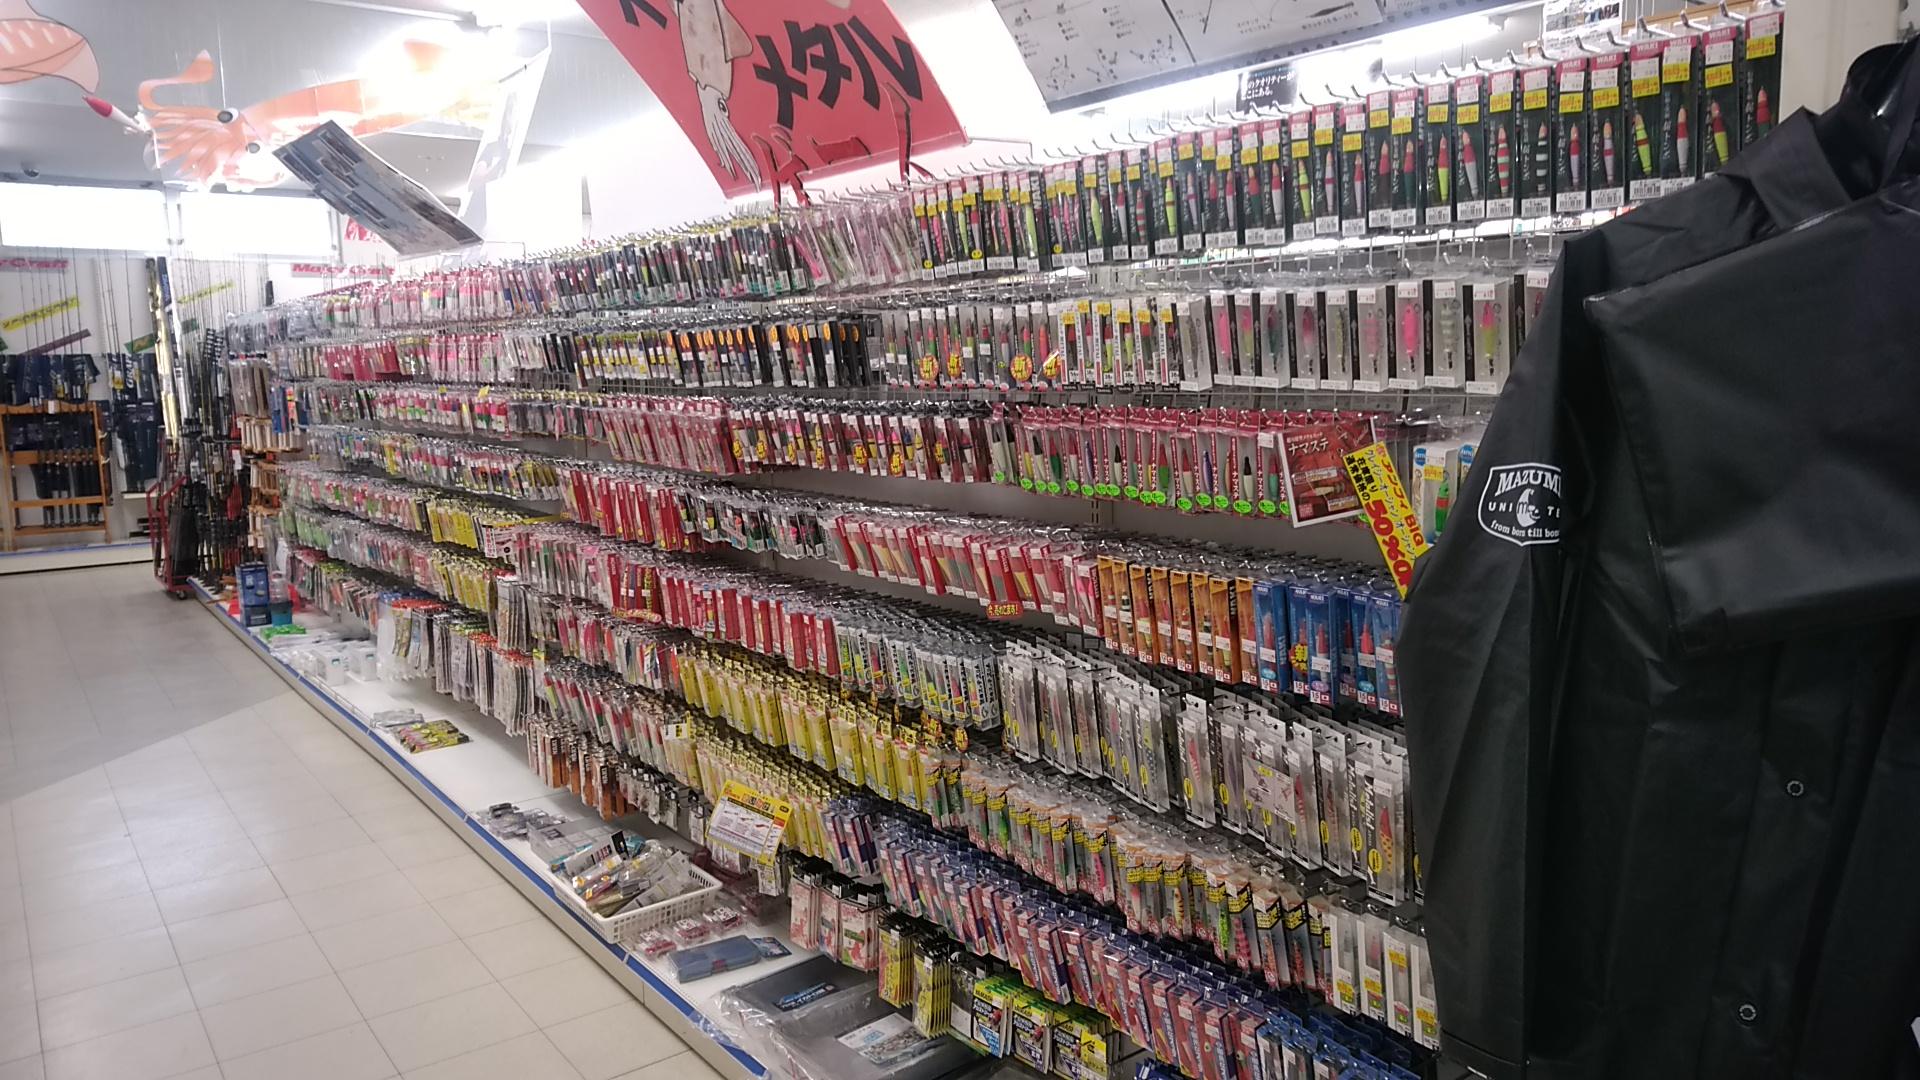 http://www.e-angle.co.jp/shop/news/yamaguchi6.jpg